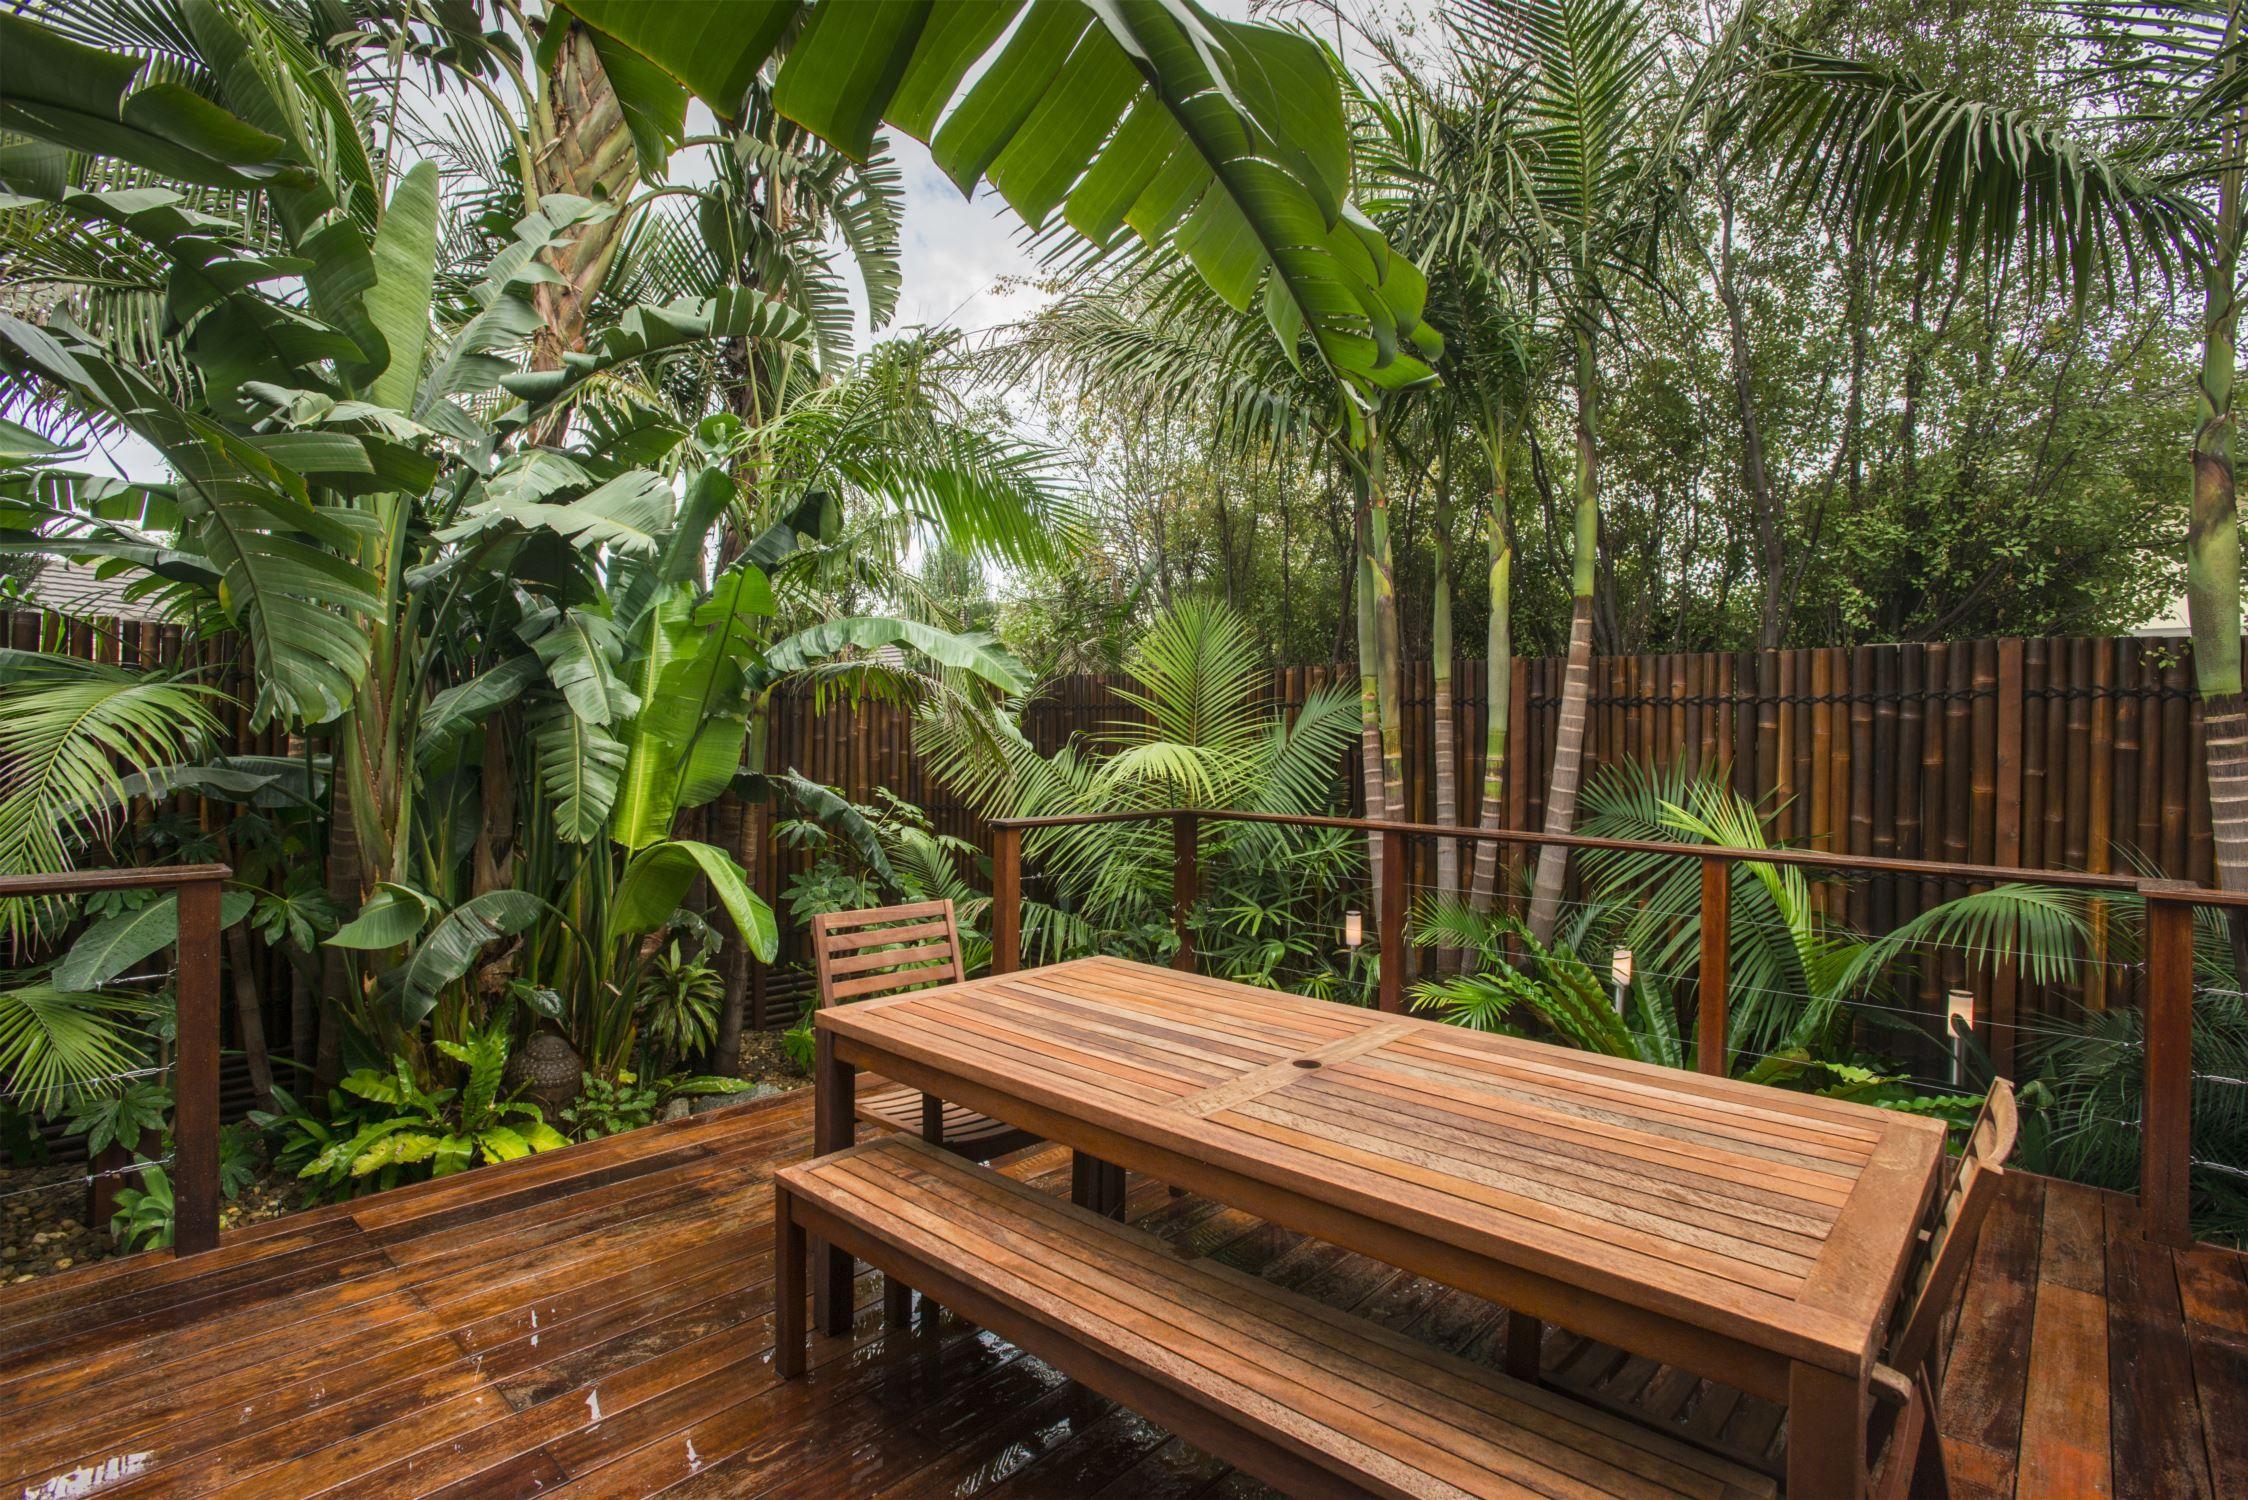 bali garden bing images bali garden balinese garden on attractive tropical landscaping ideas id=65206